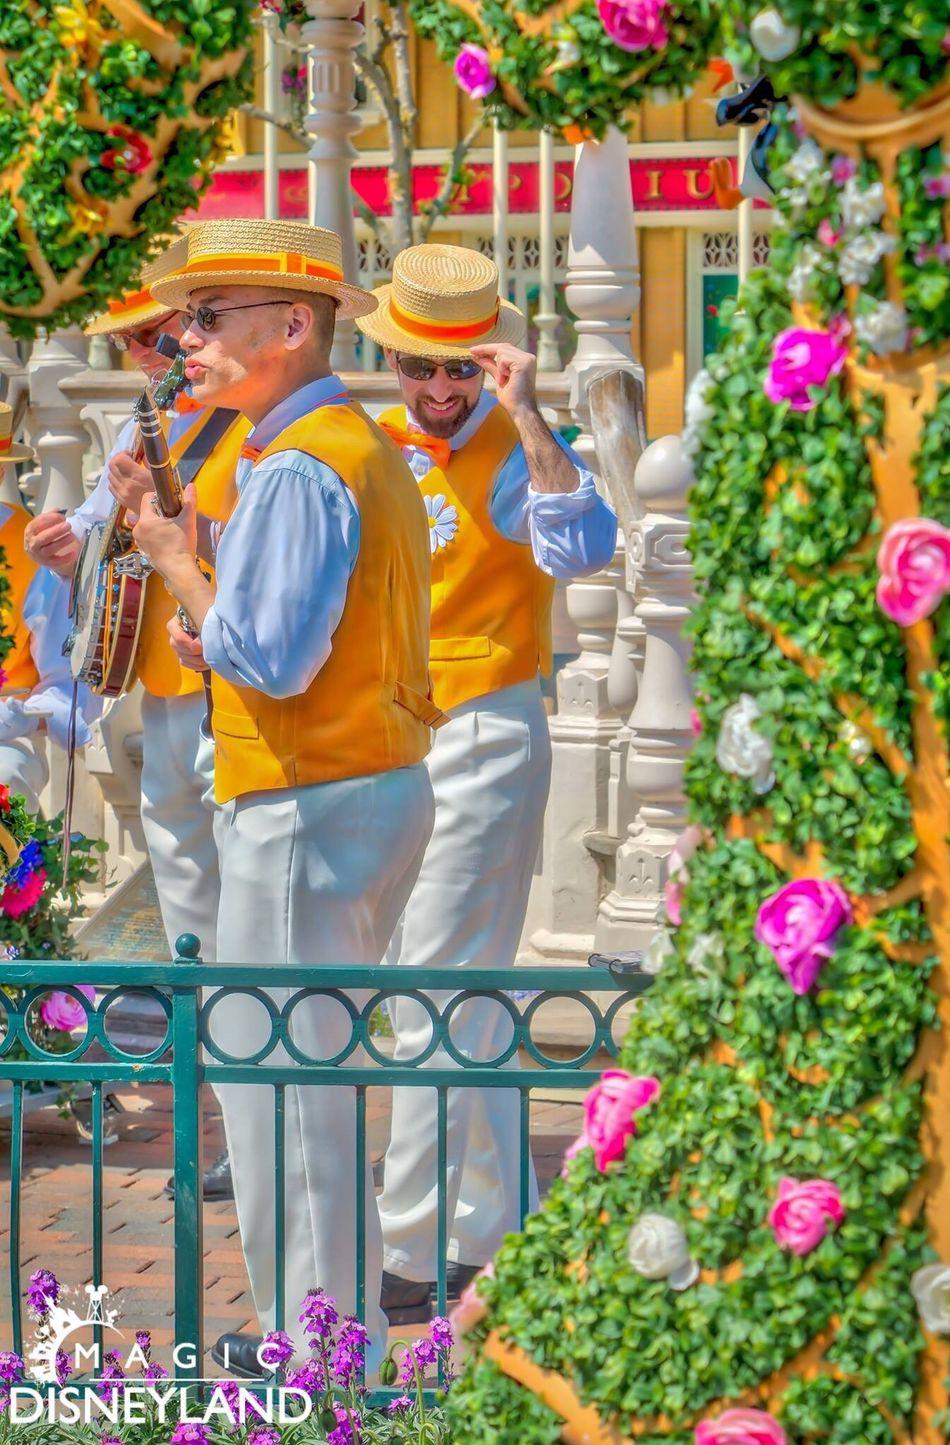 Flower Disneyland Large Group Of People Traditional Clothing Disneyland Resort Paris Disneyland Paris Amusement Park Disneylandparis Celebration Disney Multi Colored Travel Destinations